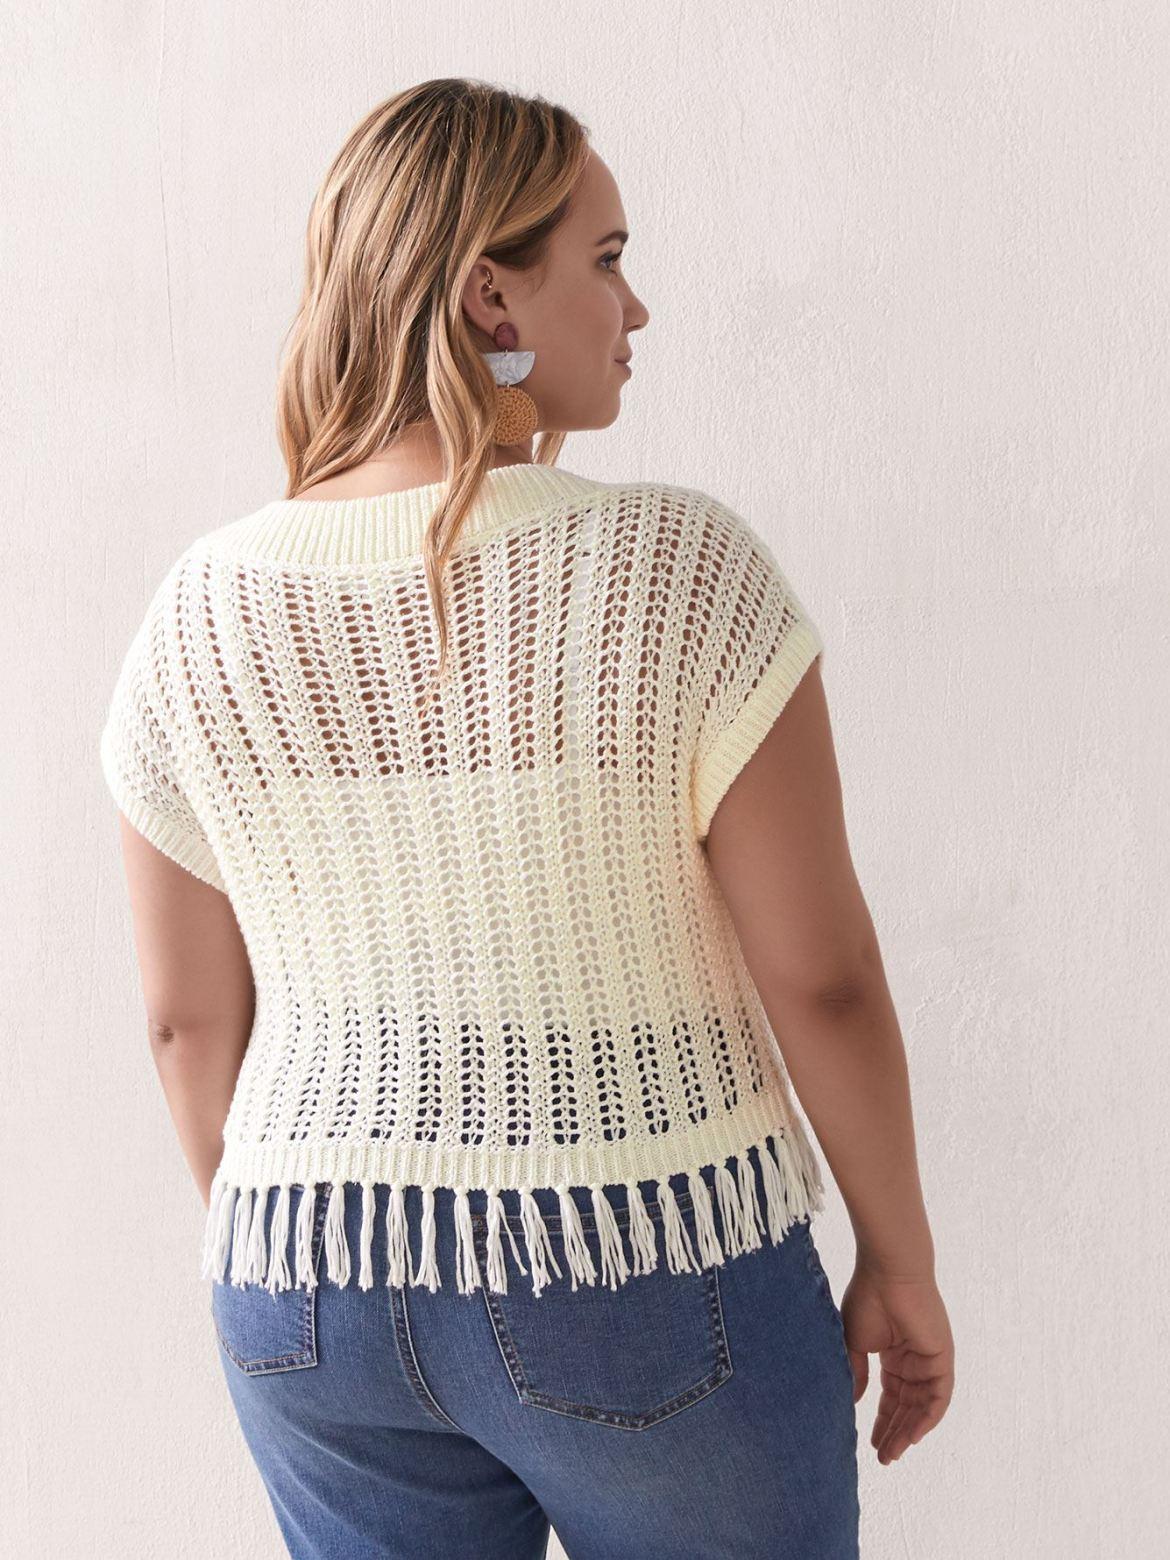 Crochet Sweater with Fringed Hem - Addition Elle